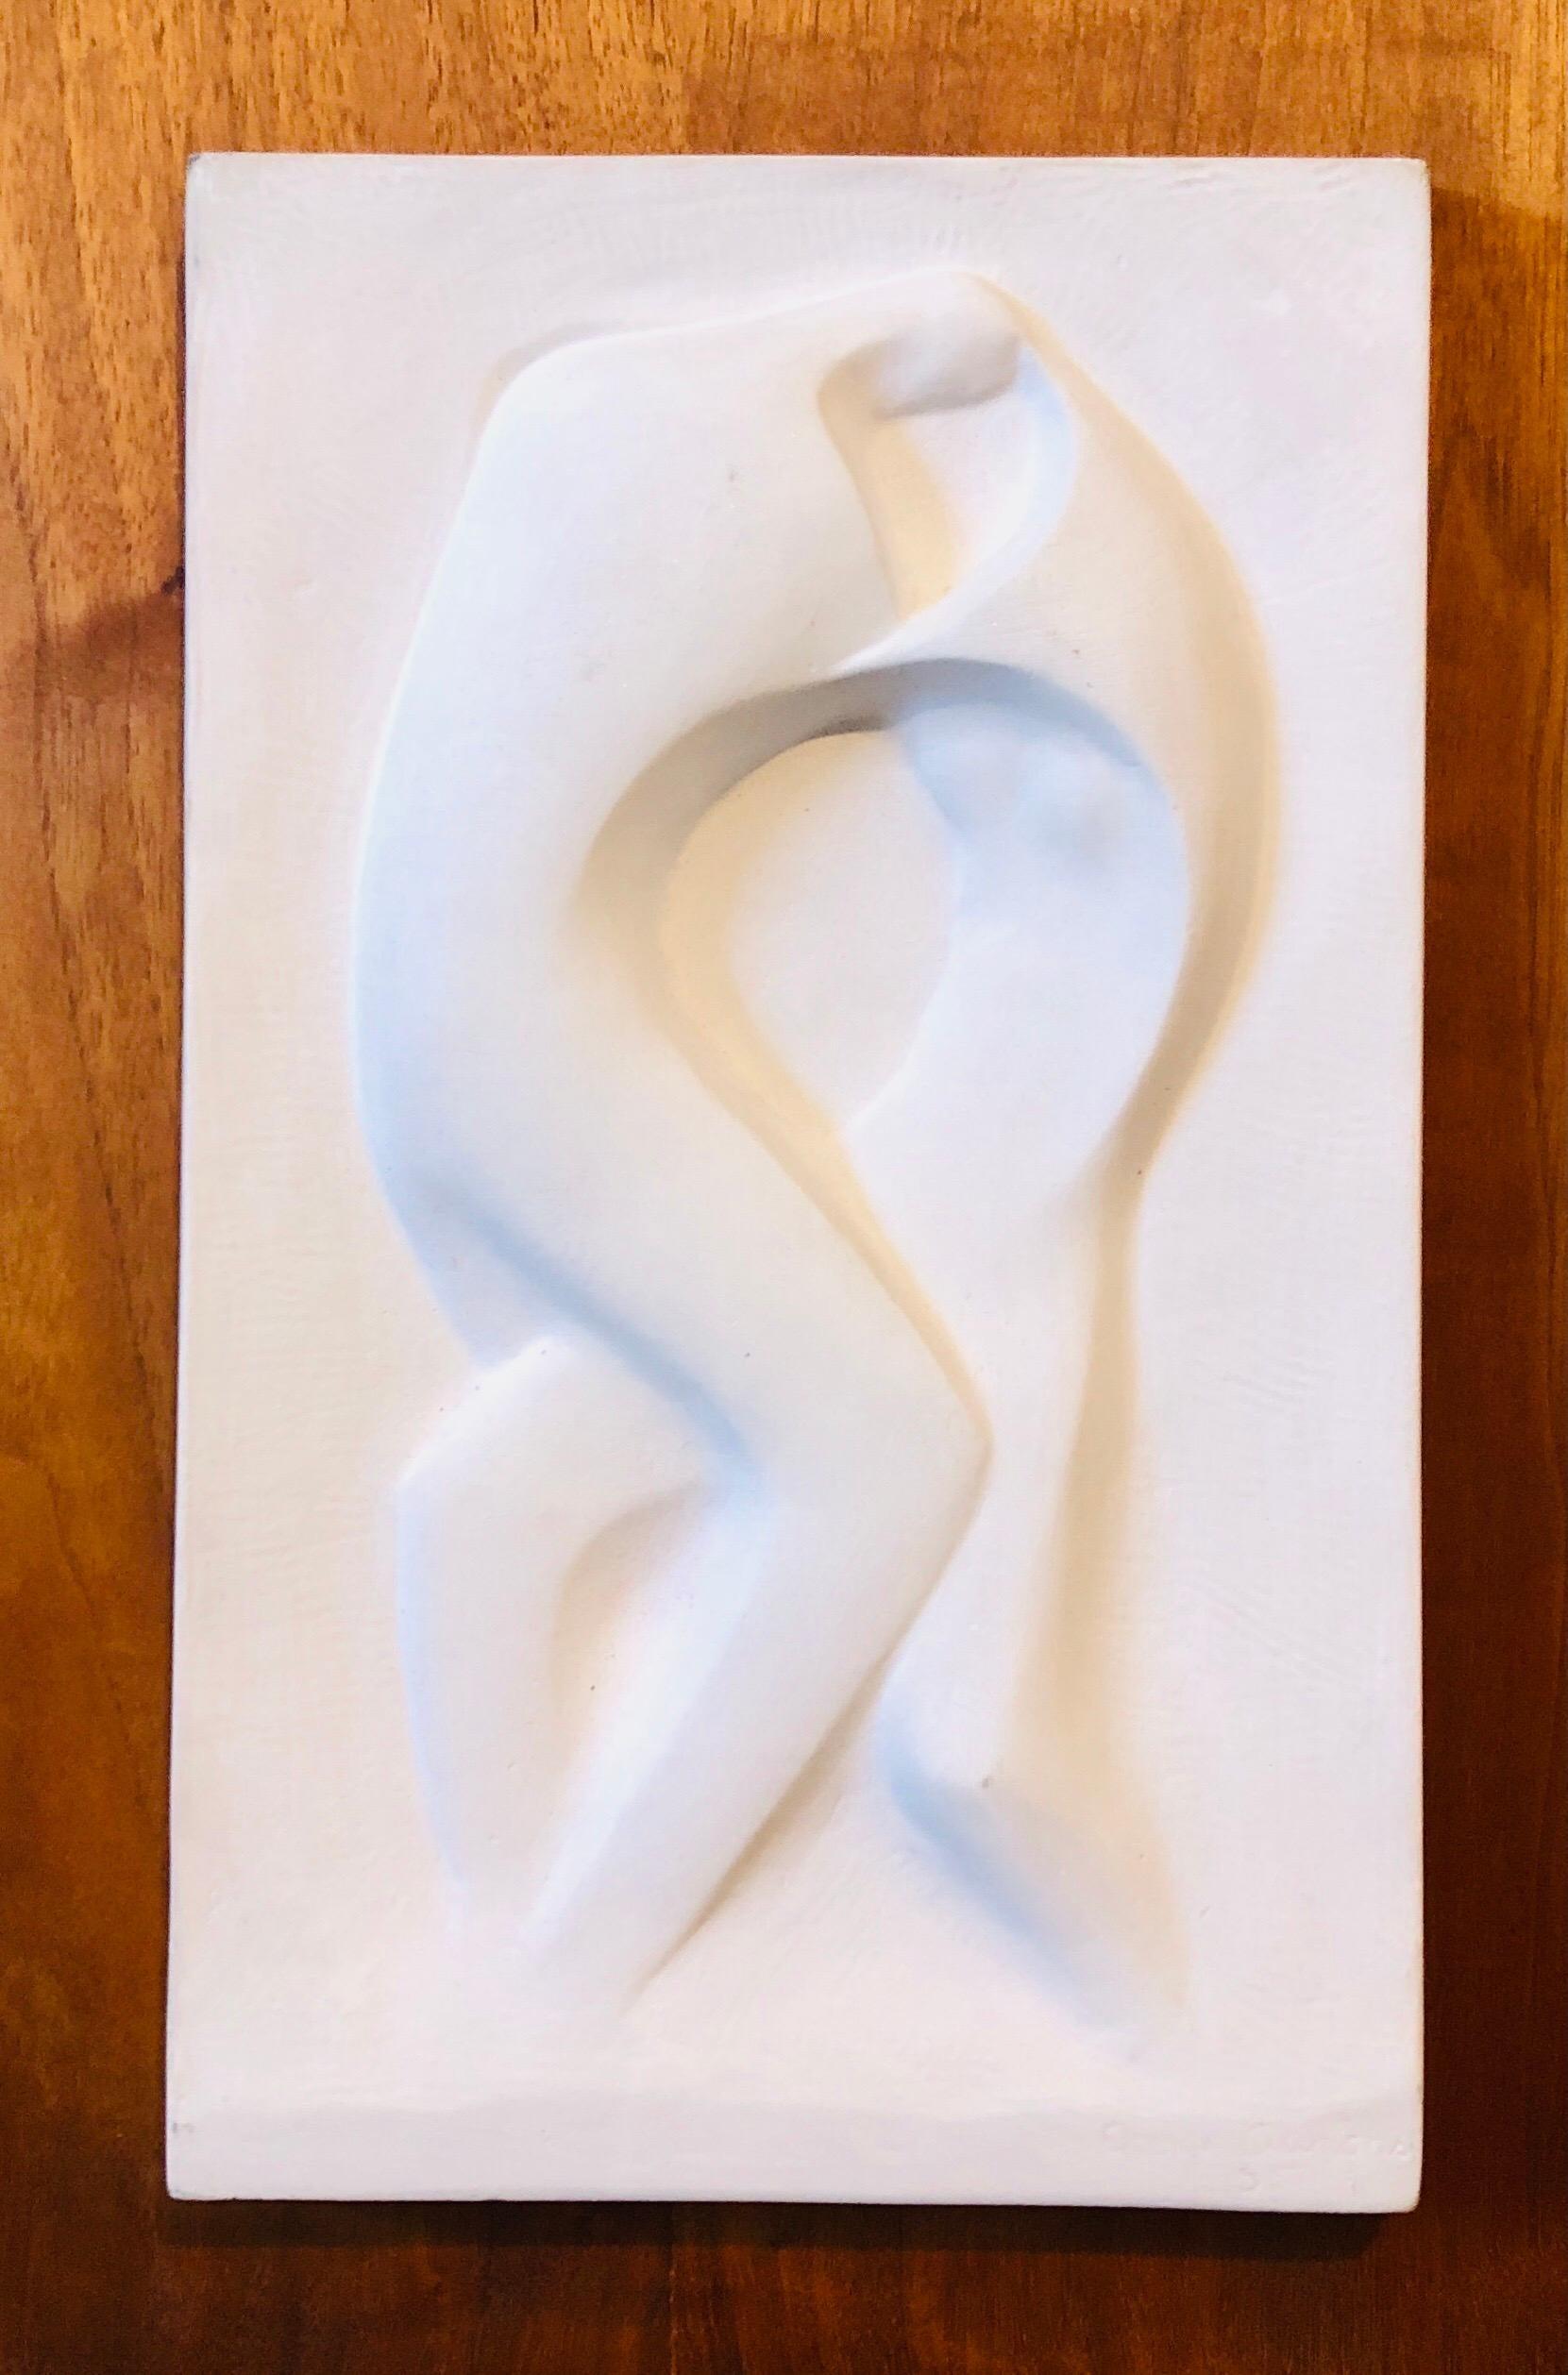 Plaster Sculpture Relief Art Deco Plaque WPA Artist Lovers Embrace, Dancers